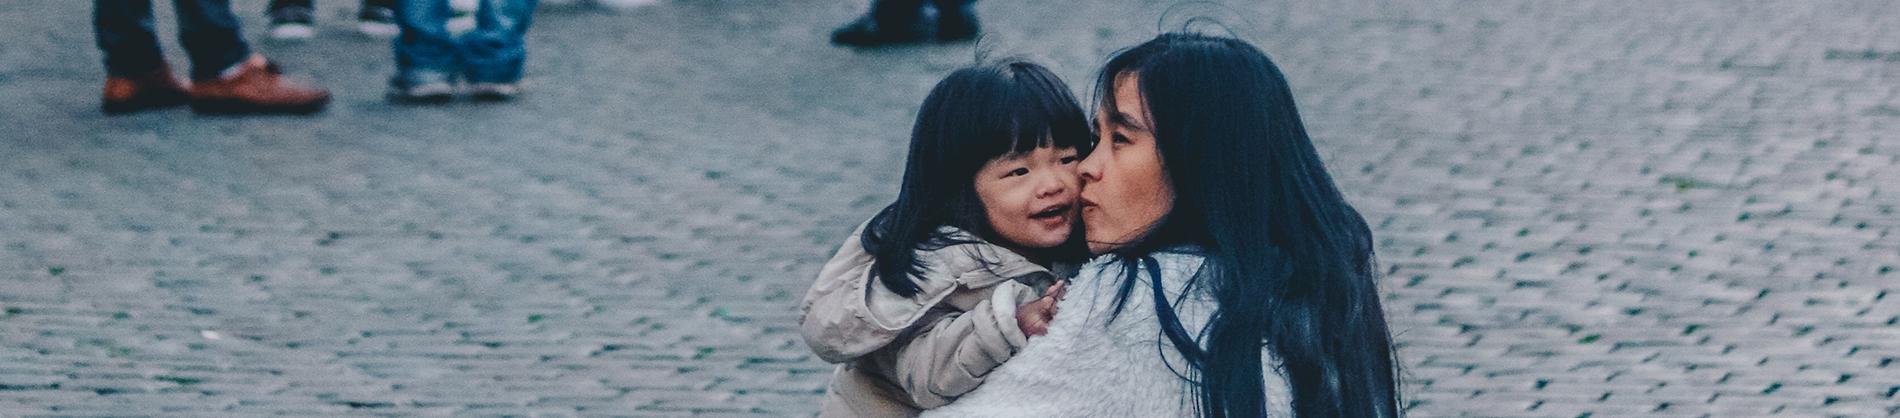 A mum crouching on the pavement cuddling her child